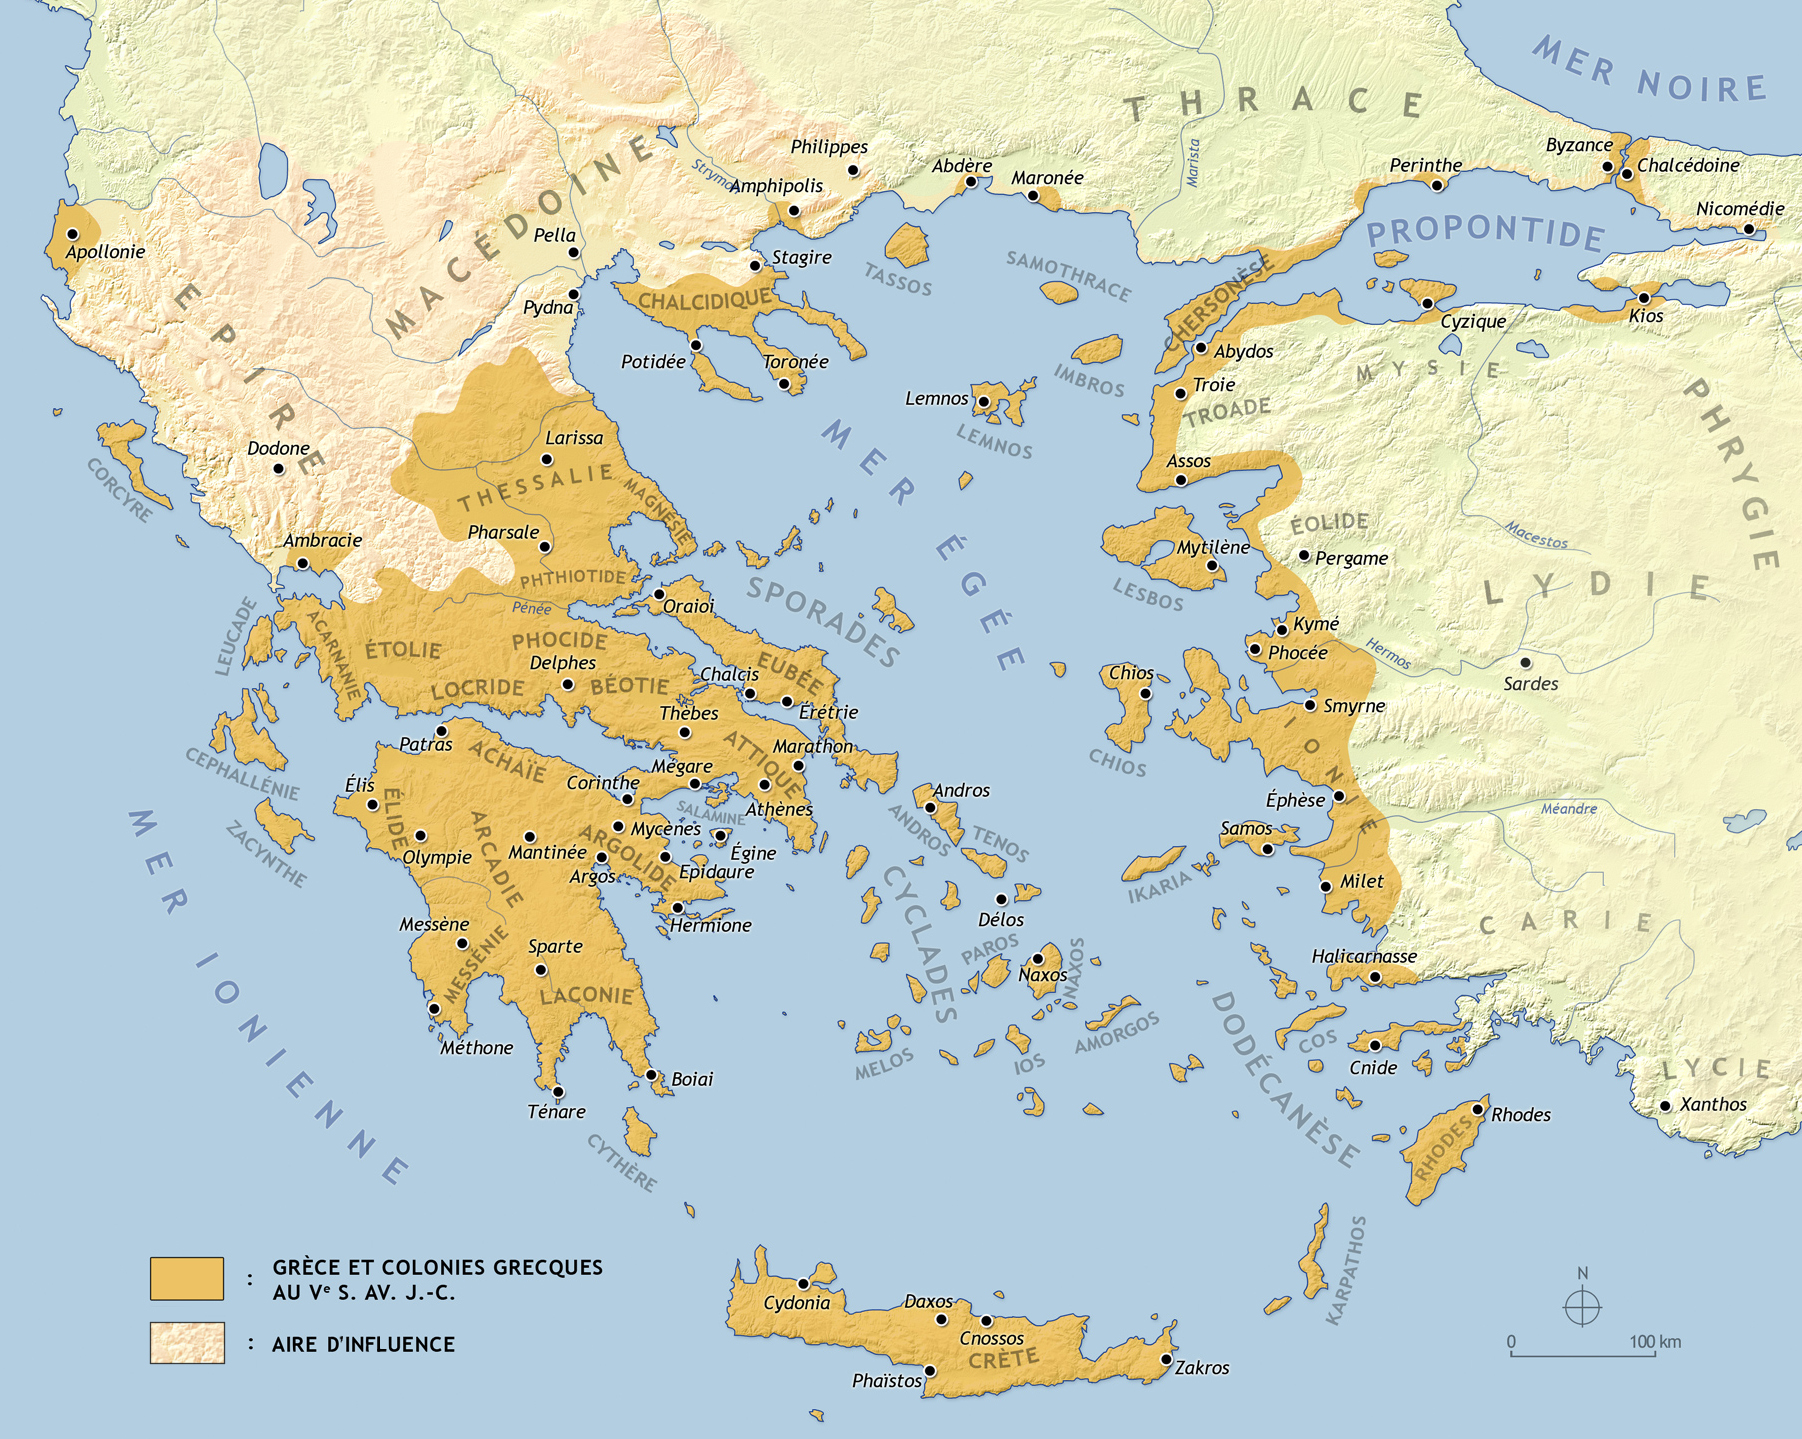 carte de la grece antique File:Carte Grece antique 02.   Wikimedia Commons